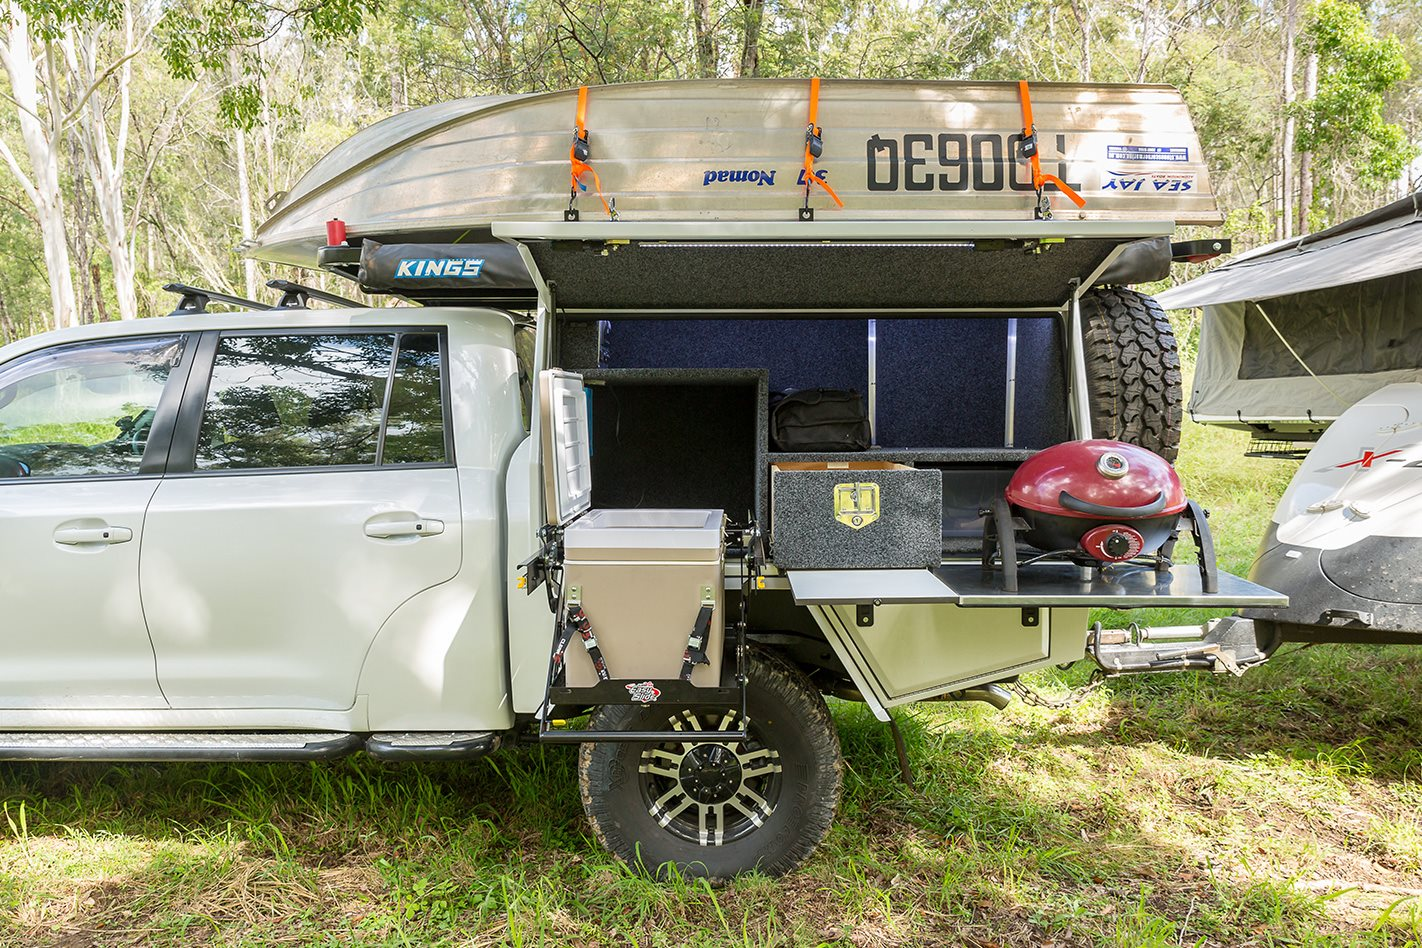 Custom Land Cruiser 200 Series carriage set-up